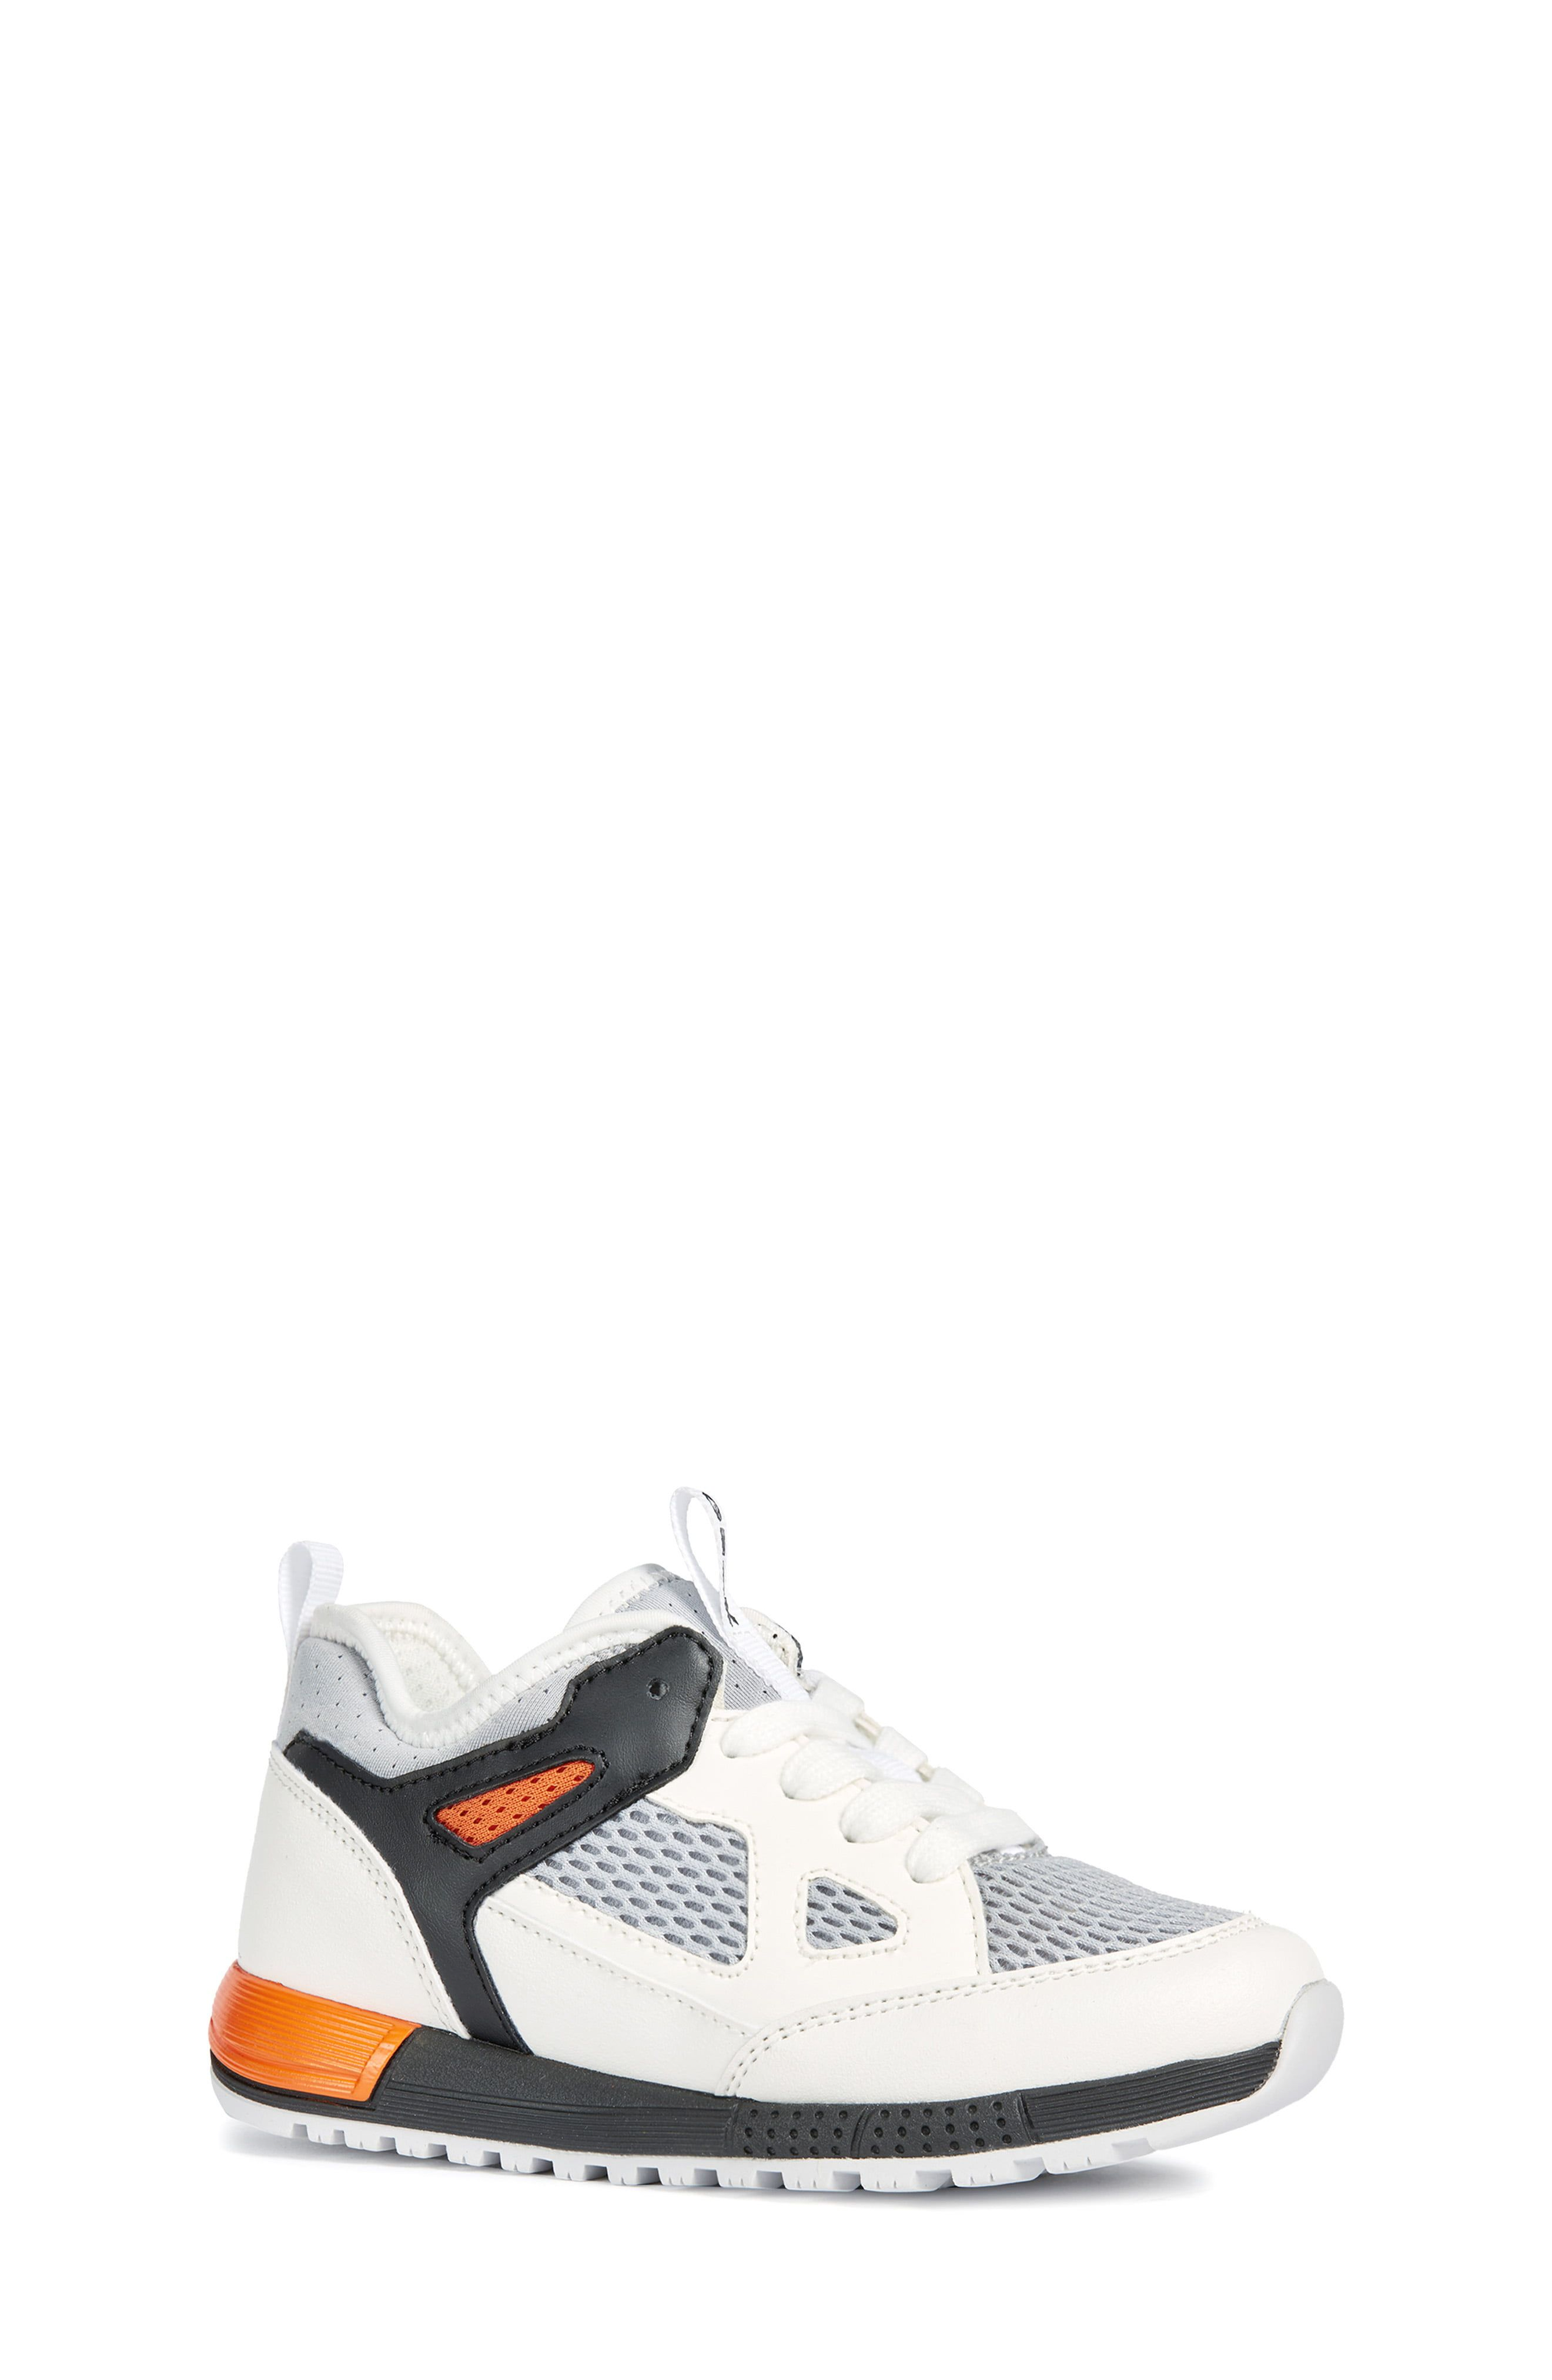 Toddler Boy S Geox Alben Sneaker Size 10 5us 28eu White In 2019 Sneakers Big Kids Nordstrom